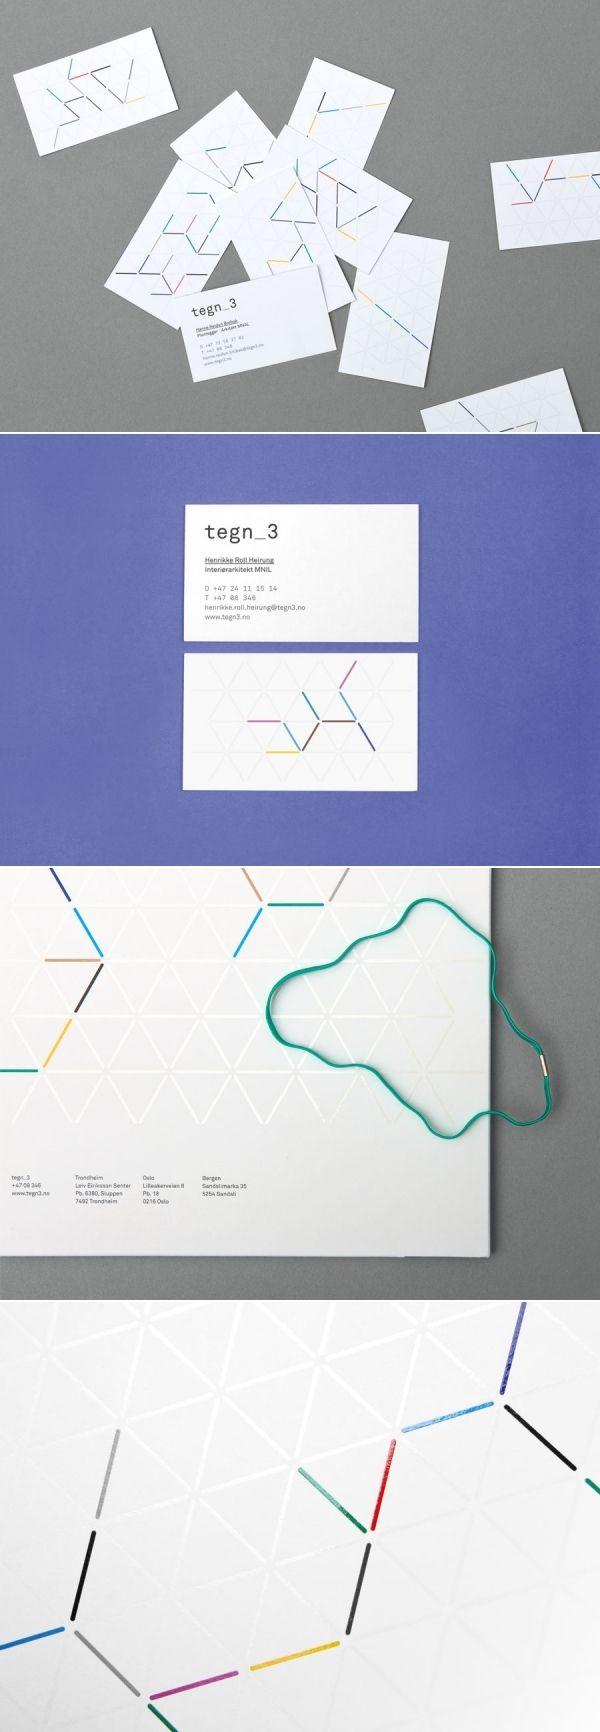 generative brand identity by Richard Baird